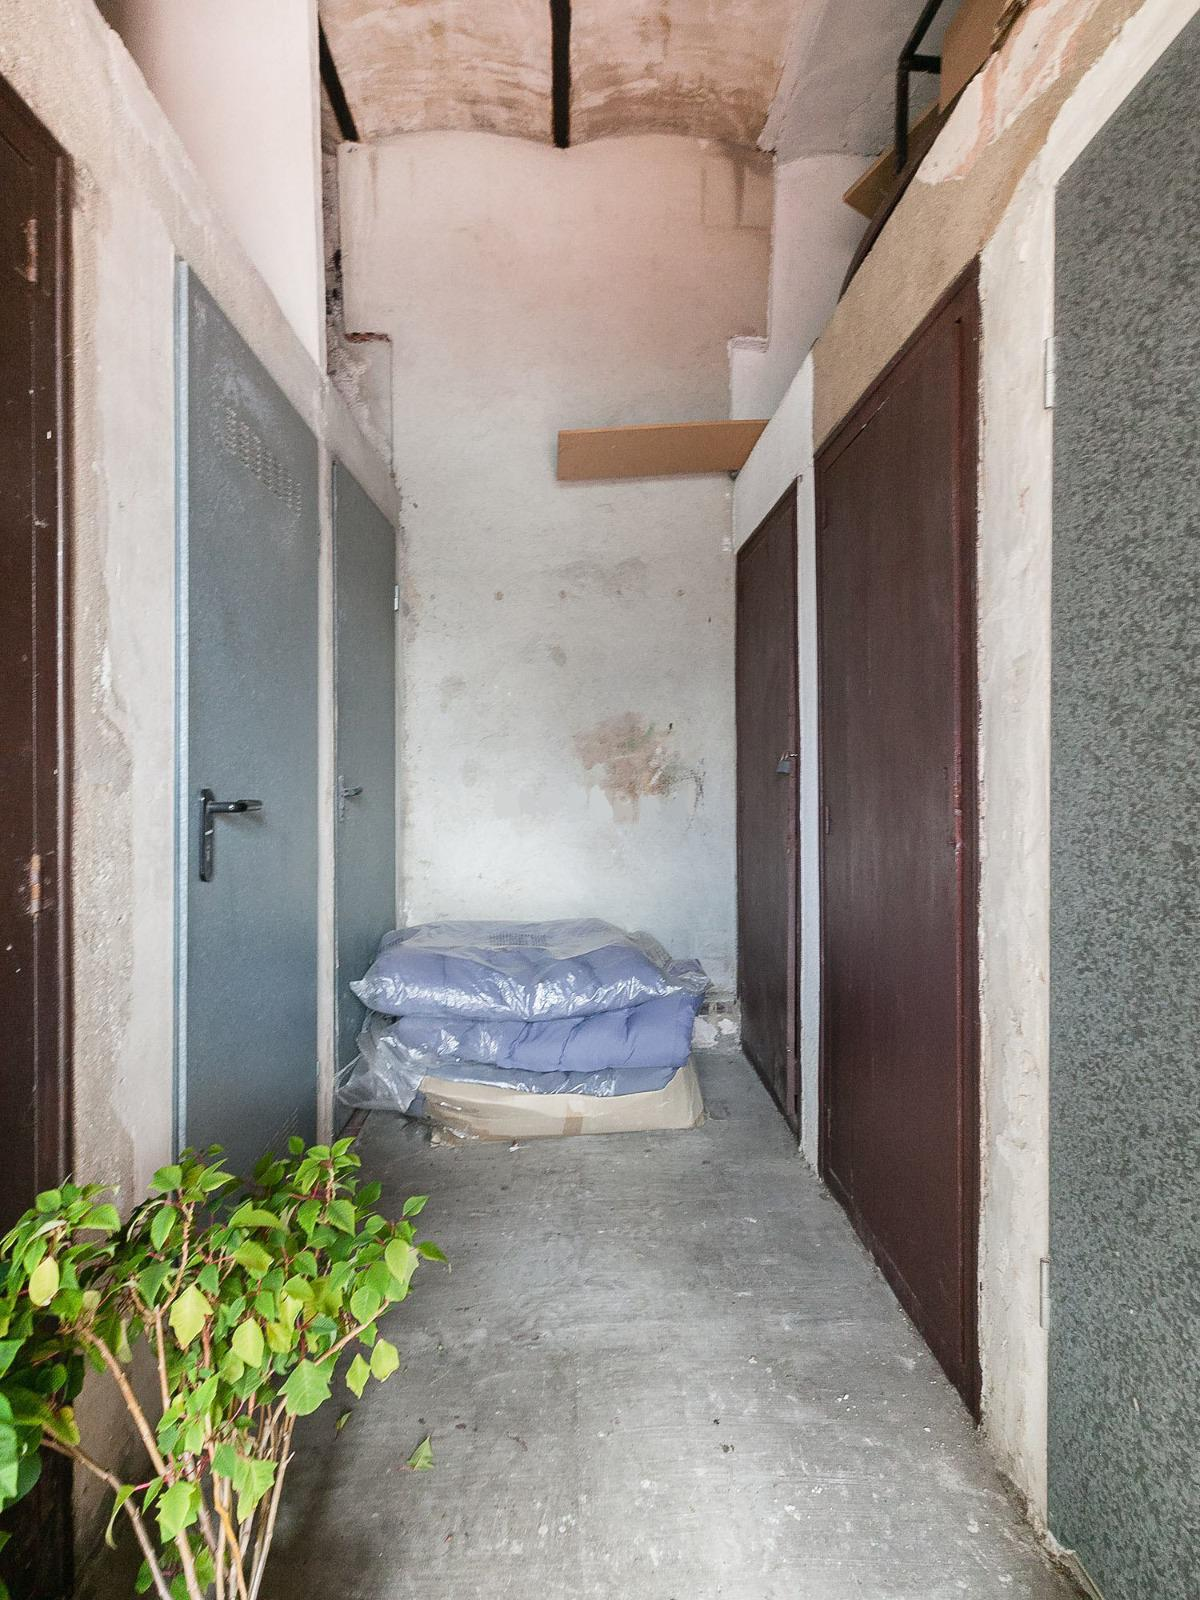 247916 Flat for sale in Sarrià-Sant Gervasi, Sant Gervasi-Galvany 31